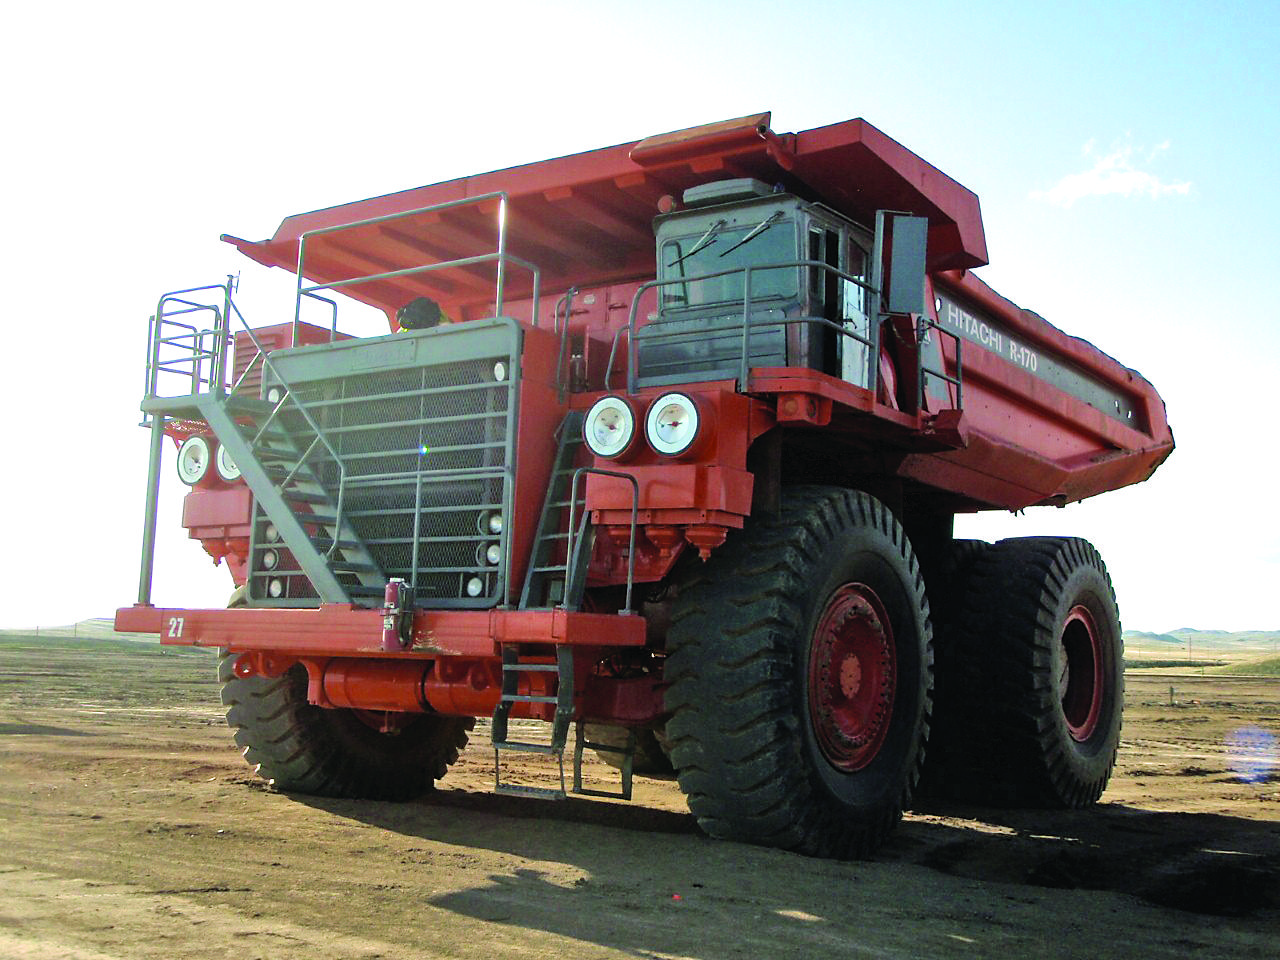 Euclid R170 rock truck